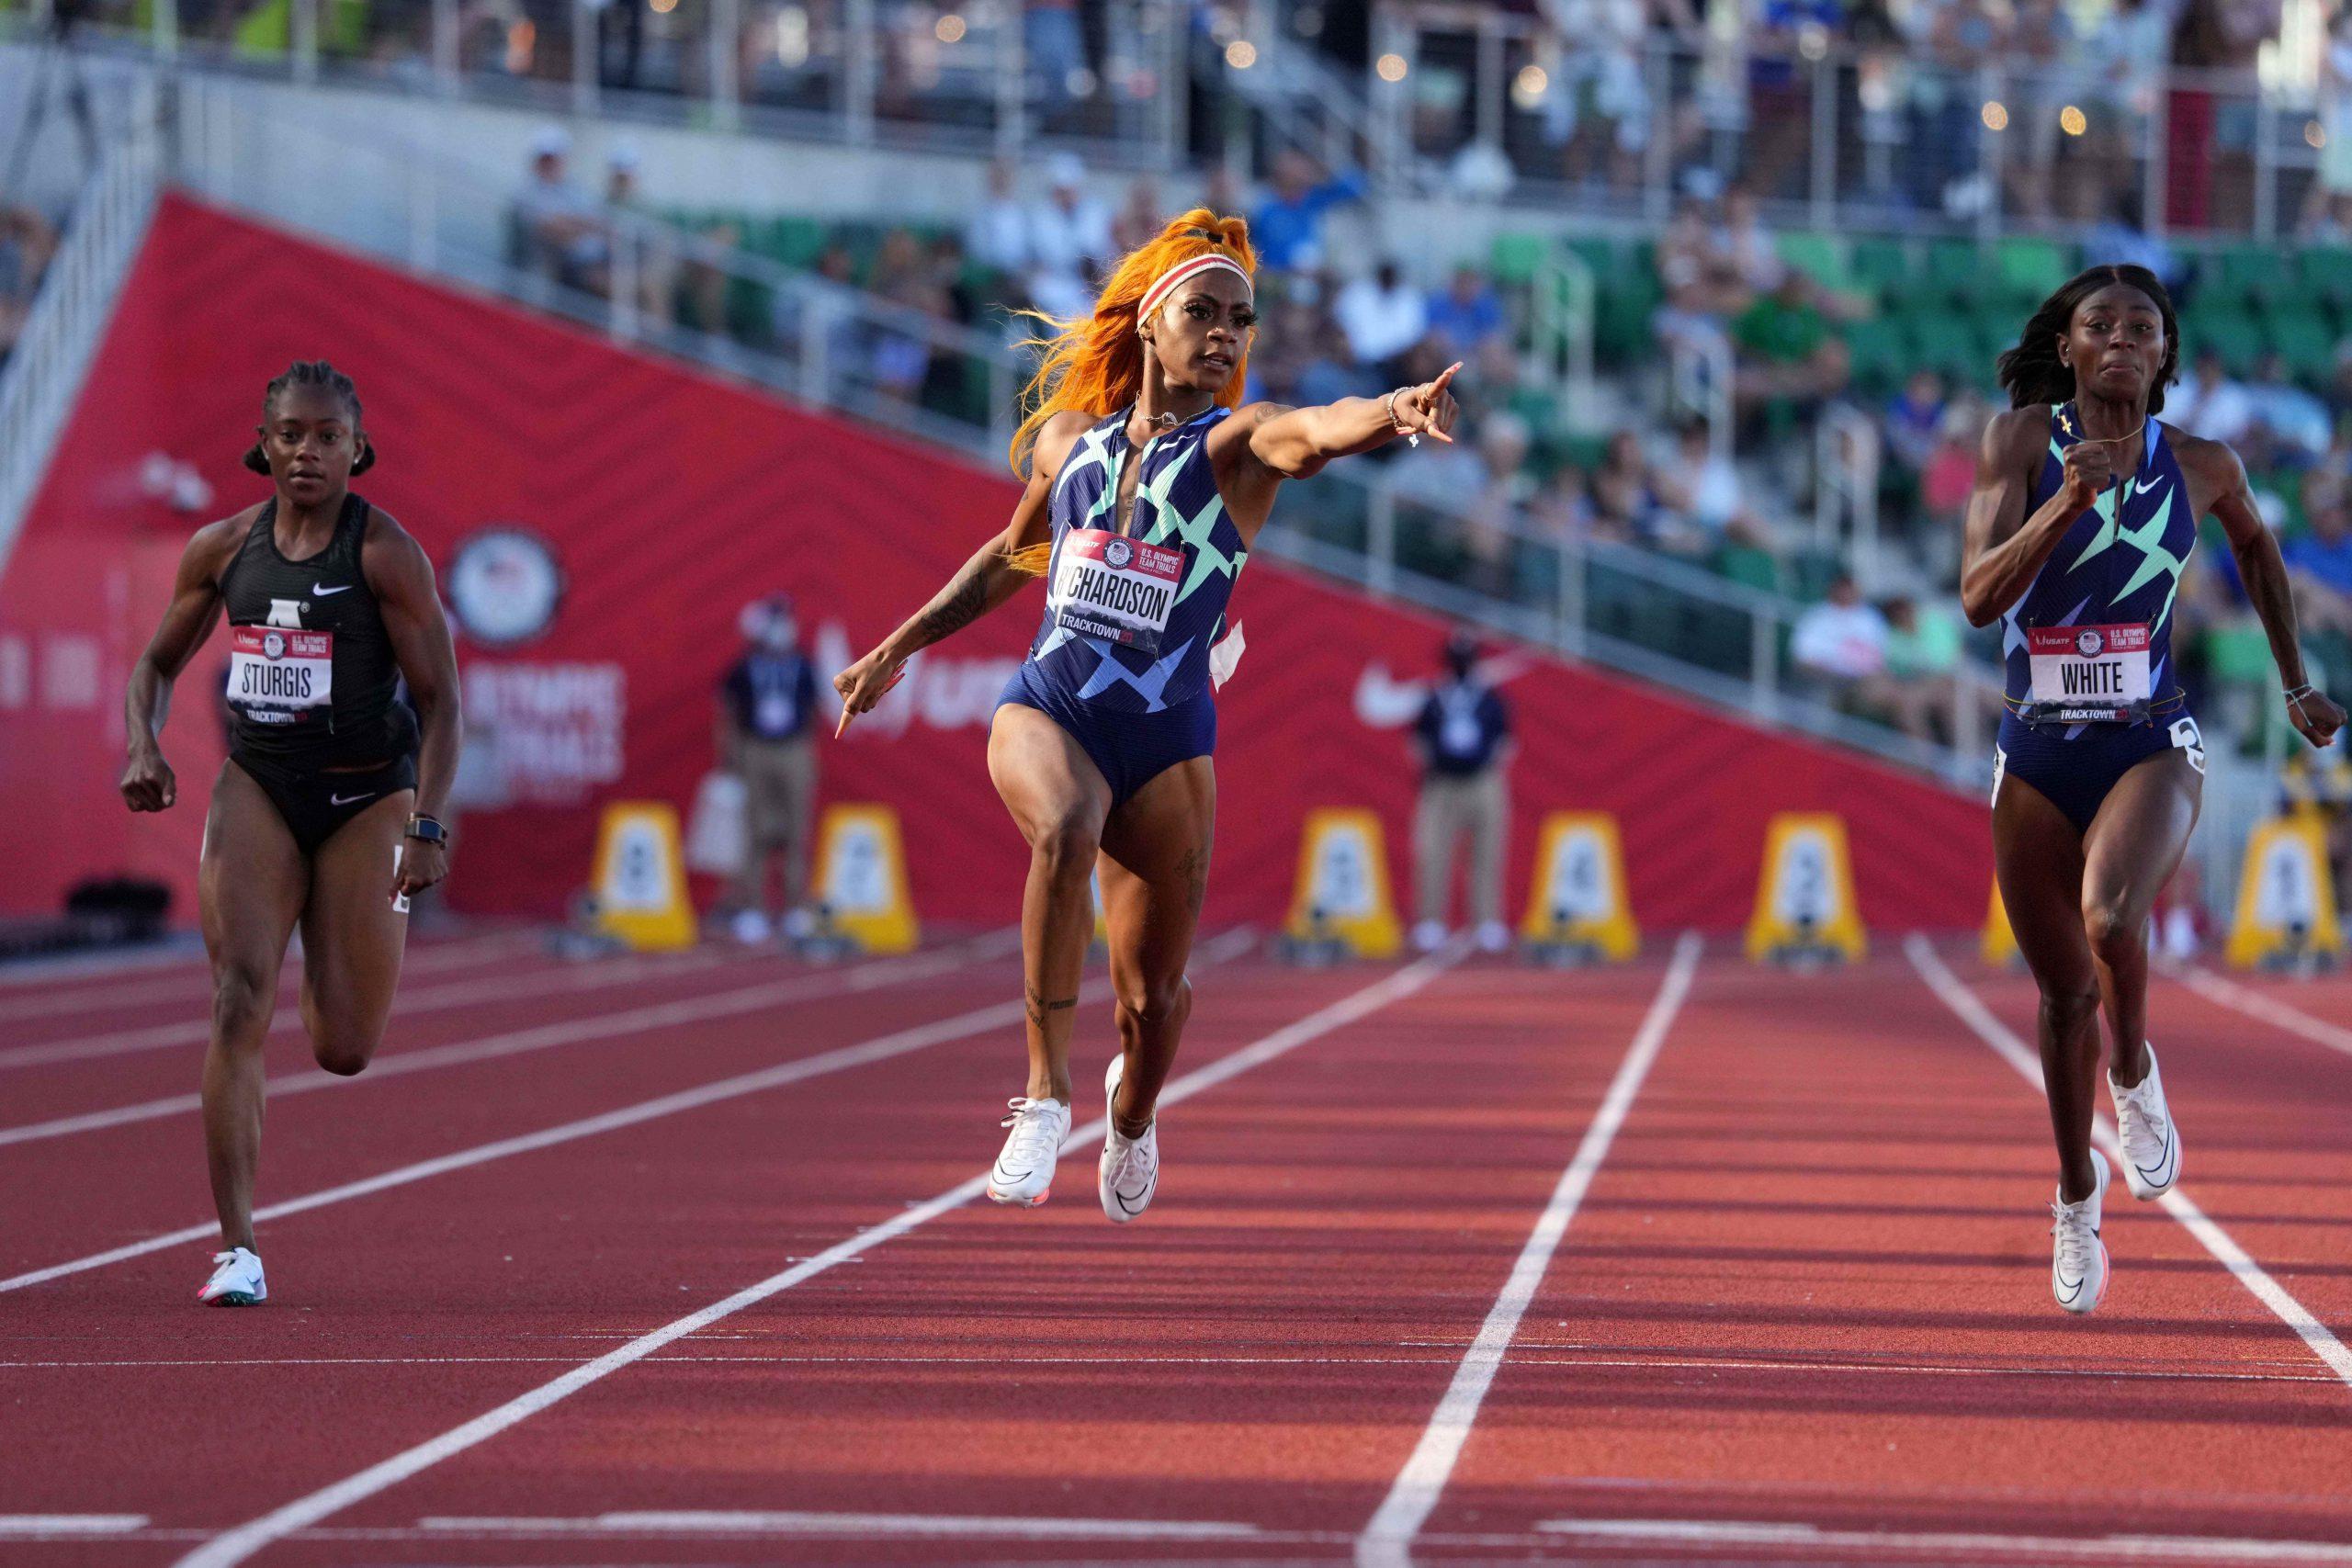 d18798e4-4b7d-4700-814b-7e59512933f3-USP_Track__Field__USA_Olympic_Team_Trials_1